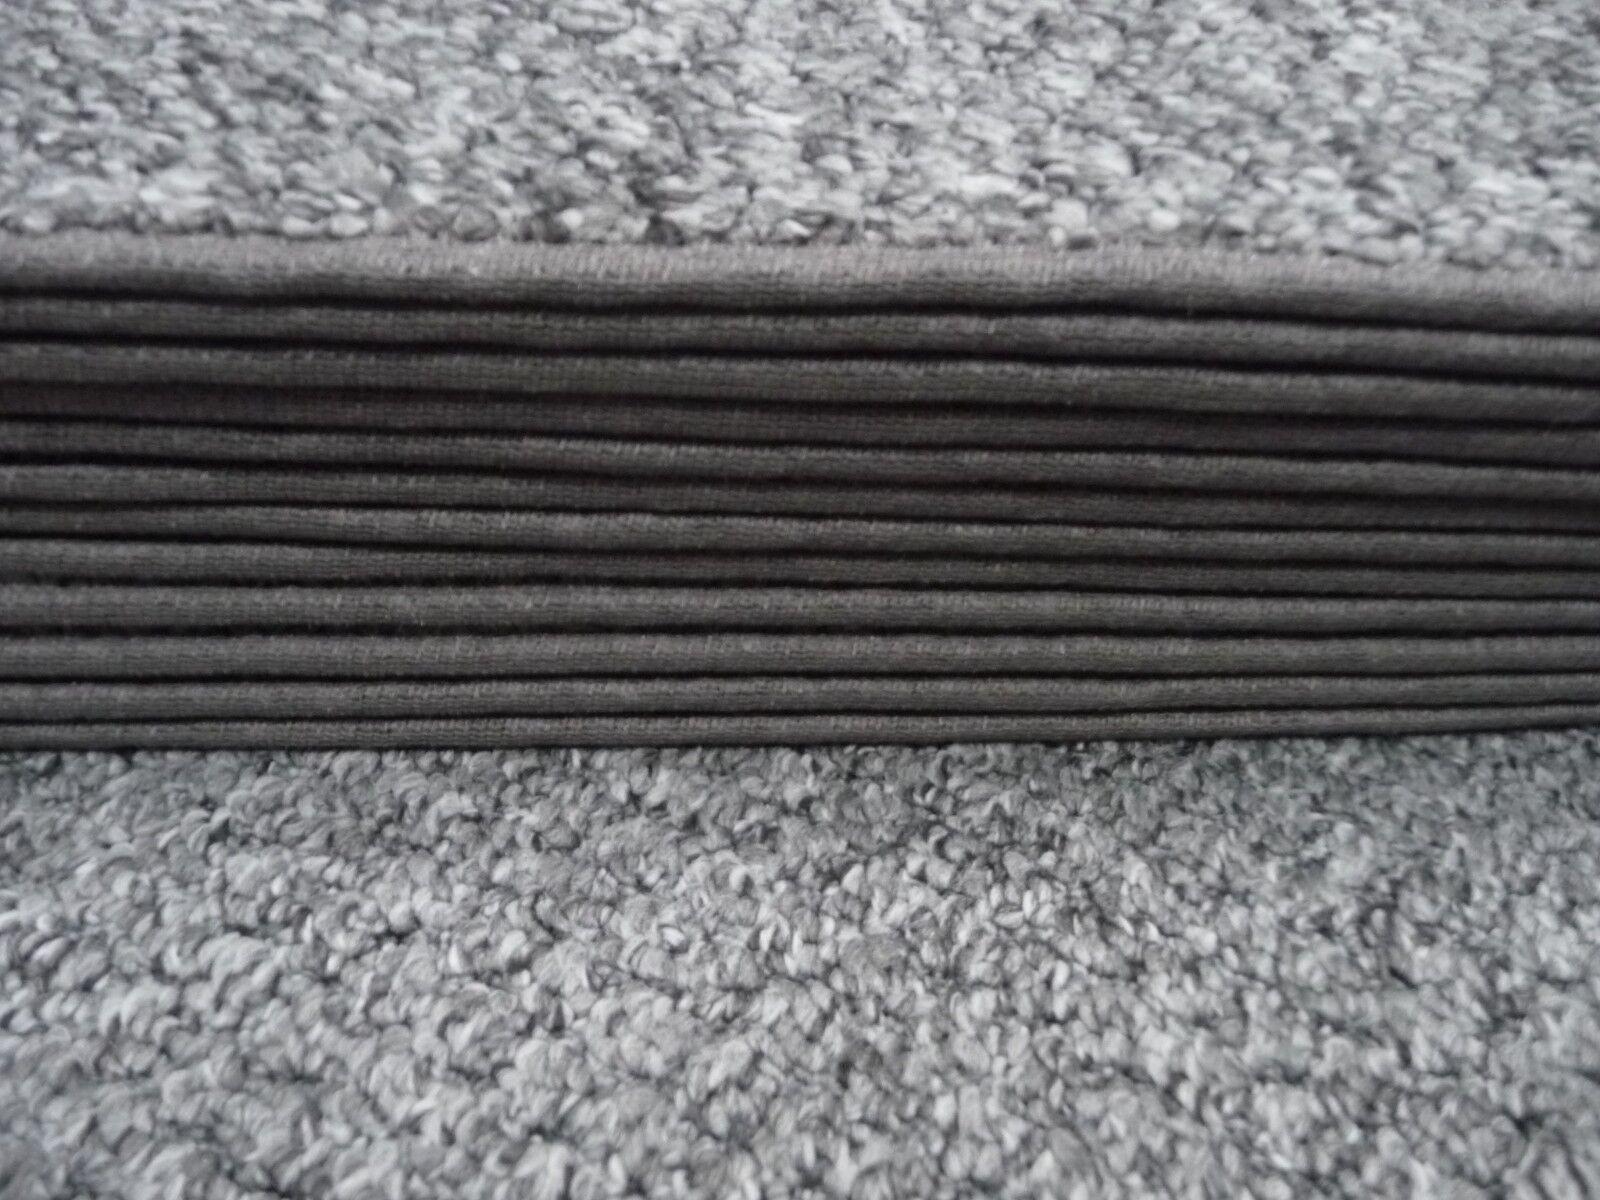 22 22 22 x 8.50 inches ( 56 x 22 cm) HARD WEARING grau  STAIR PADS  2012 4b0755